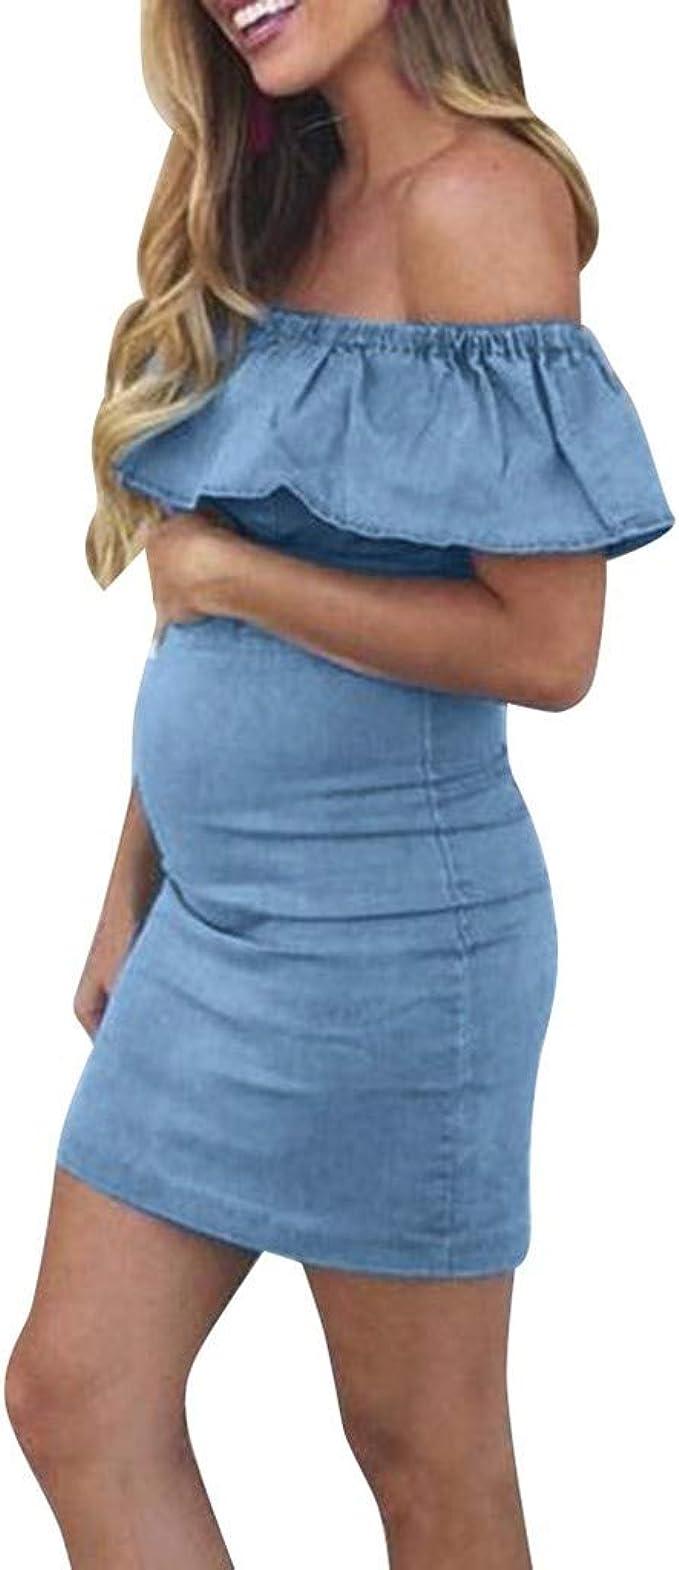 Abiti Eleganti Oviesse.Abito Di Jeans Premaman Eleganti Jeans Gonna Mini Vestiti Dress